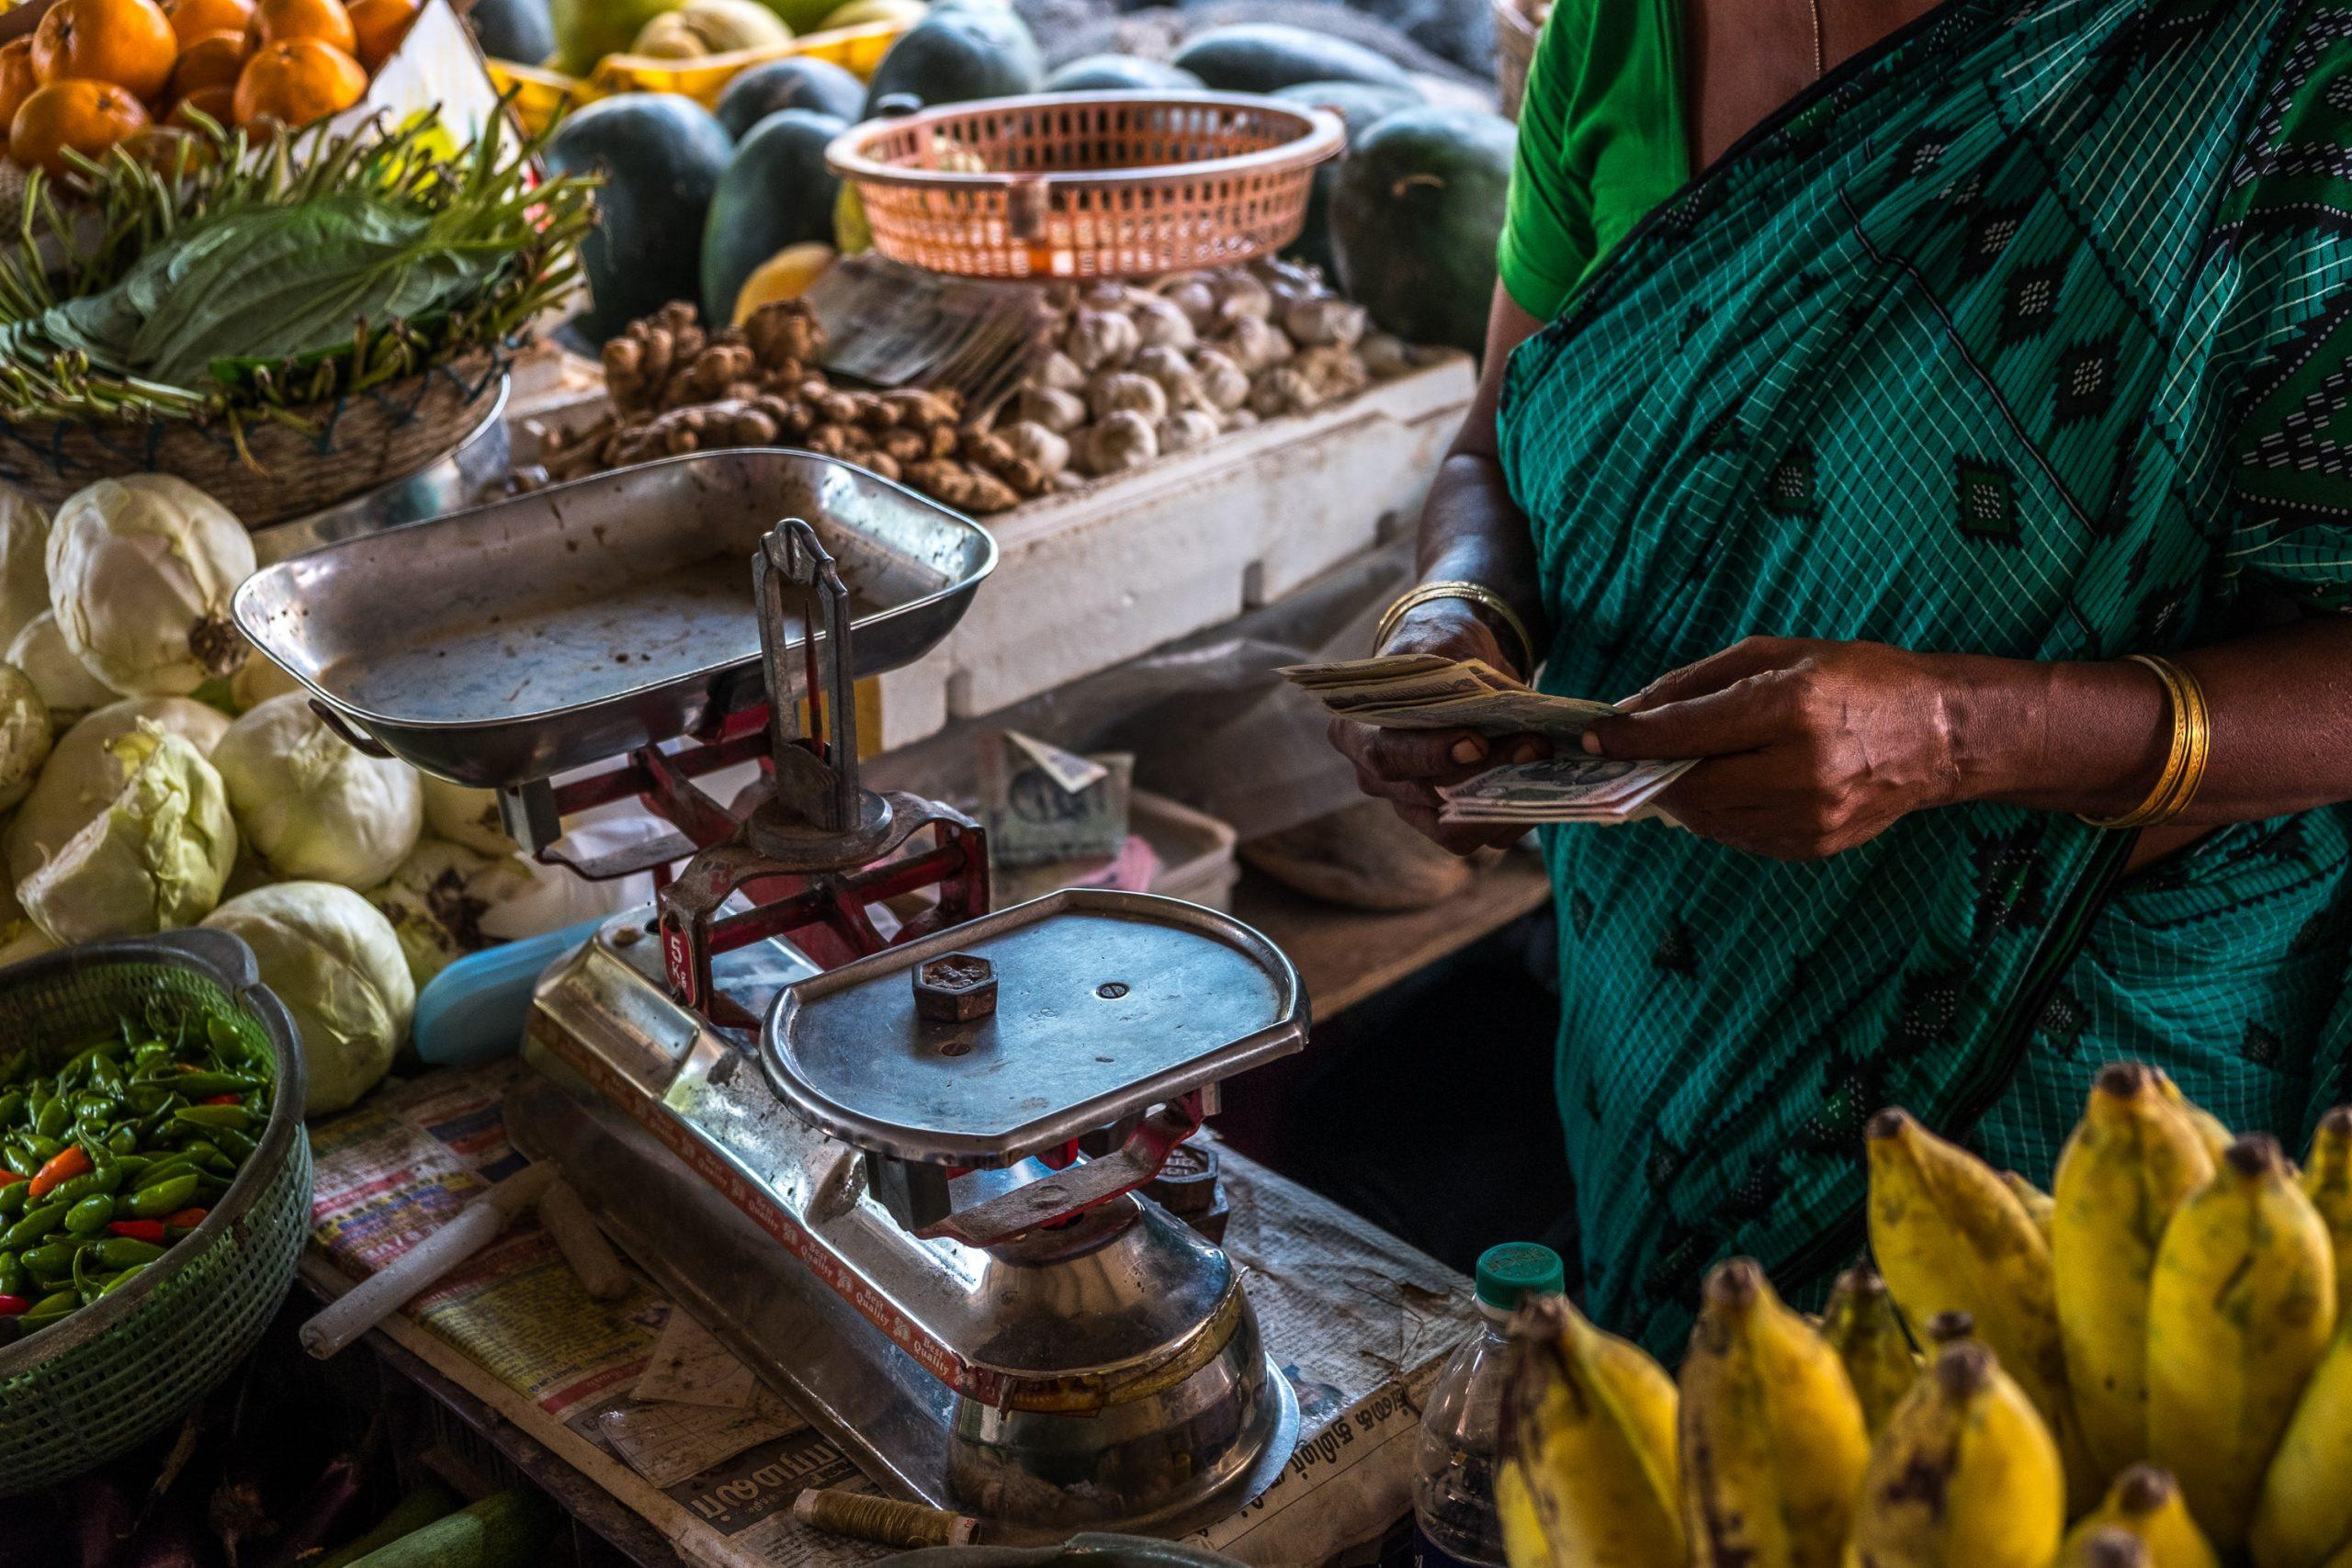 Woman vegetable vendor giving money-microenterprises